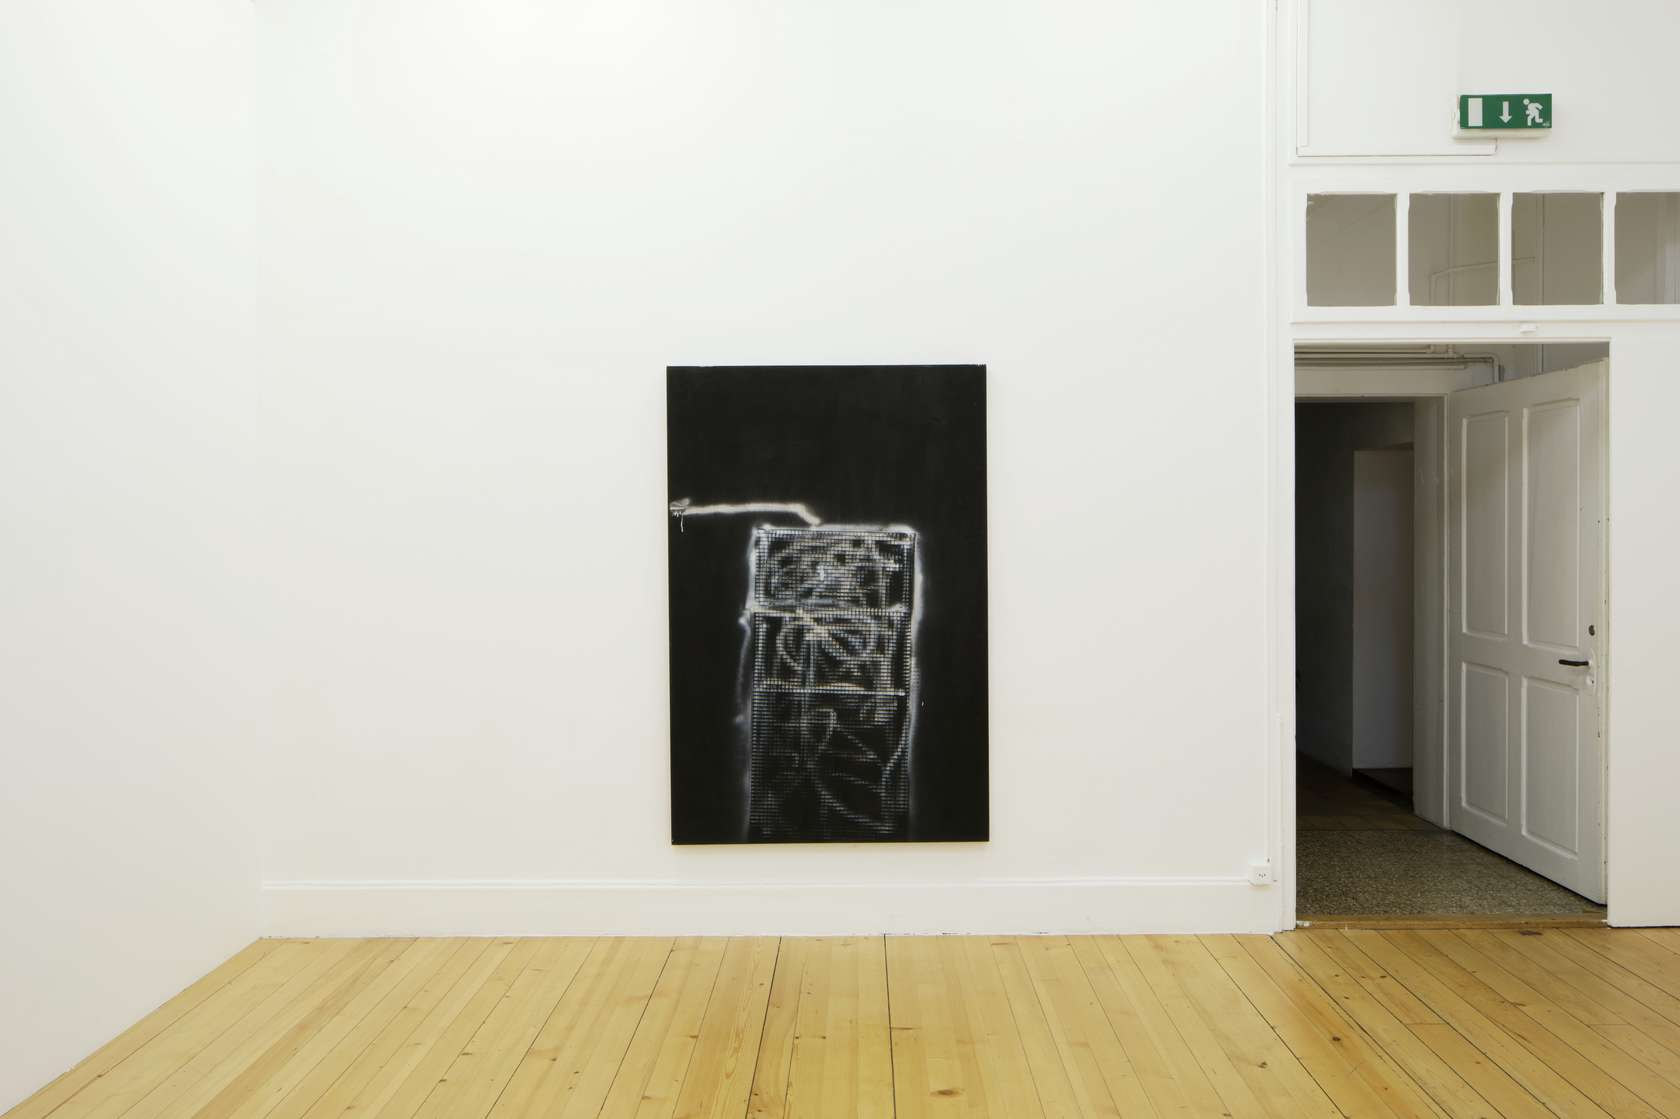 William S. Burroughs Discoteca Analitica Fri Art, Kunsthalle Fribourg (CH) 8 février  — 31 mars 2019